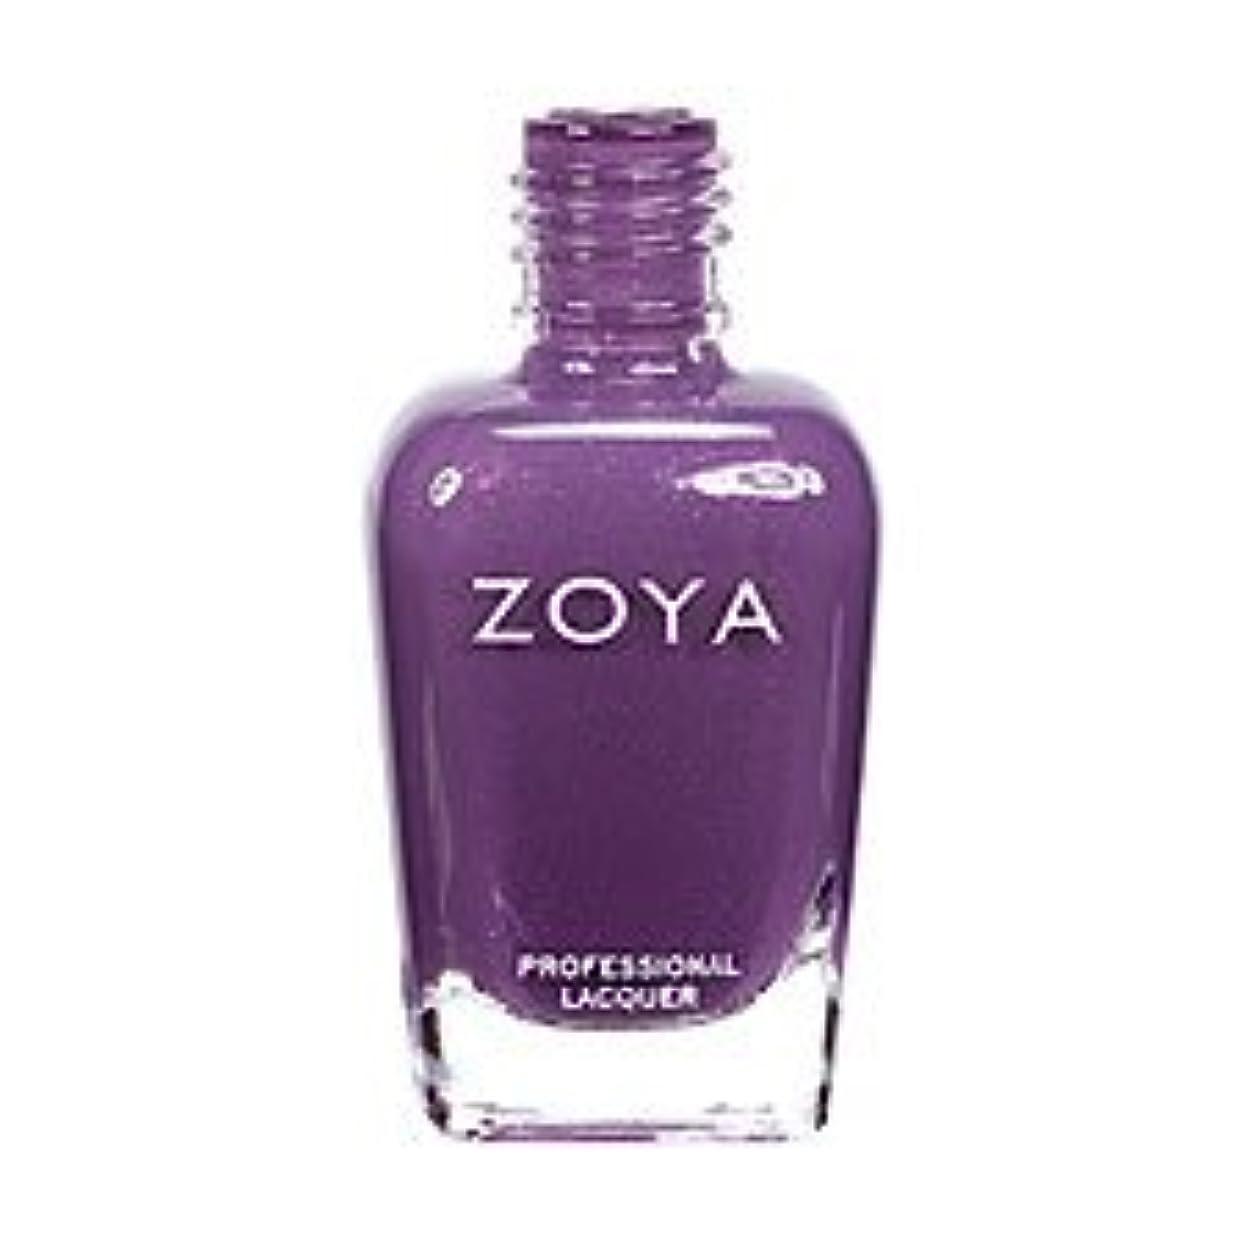 Zoya Vernis à ongles - Tru ZP589 - True Collection 2012